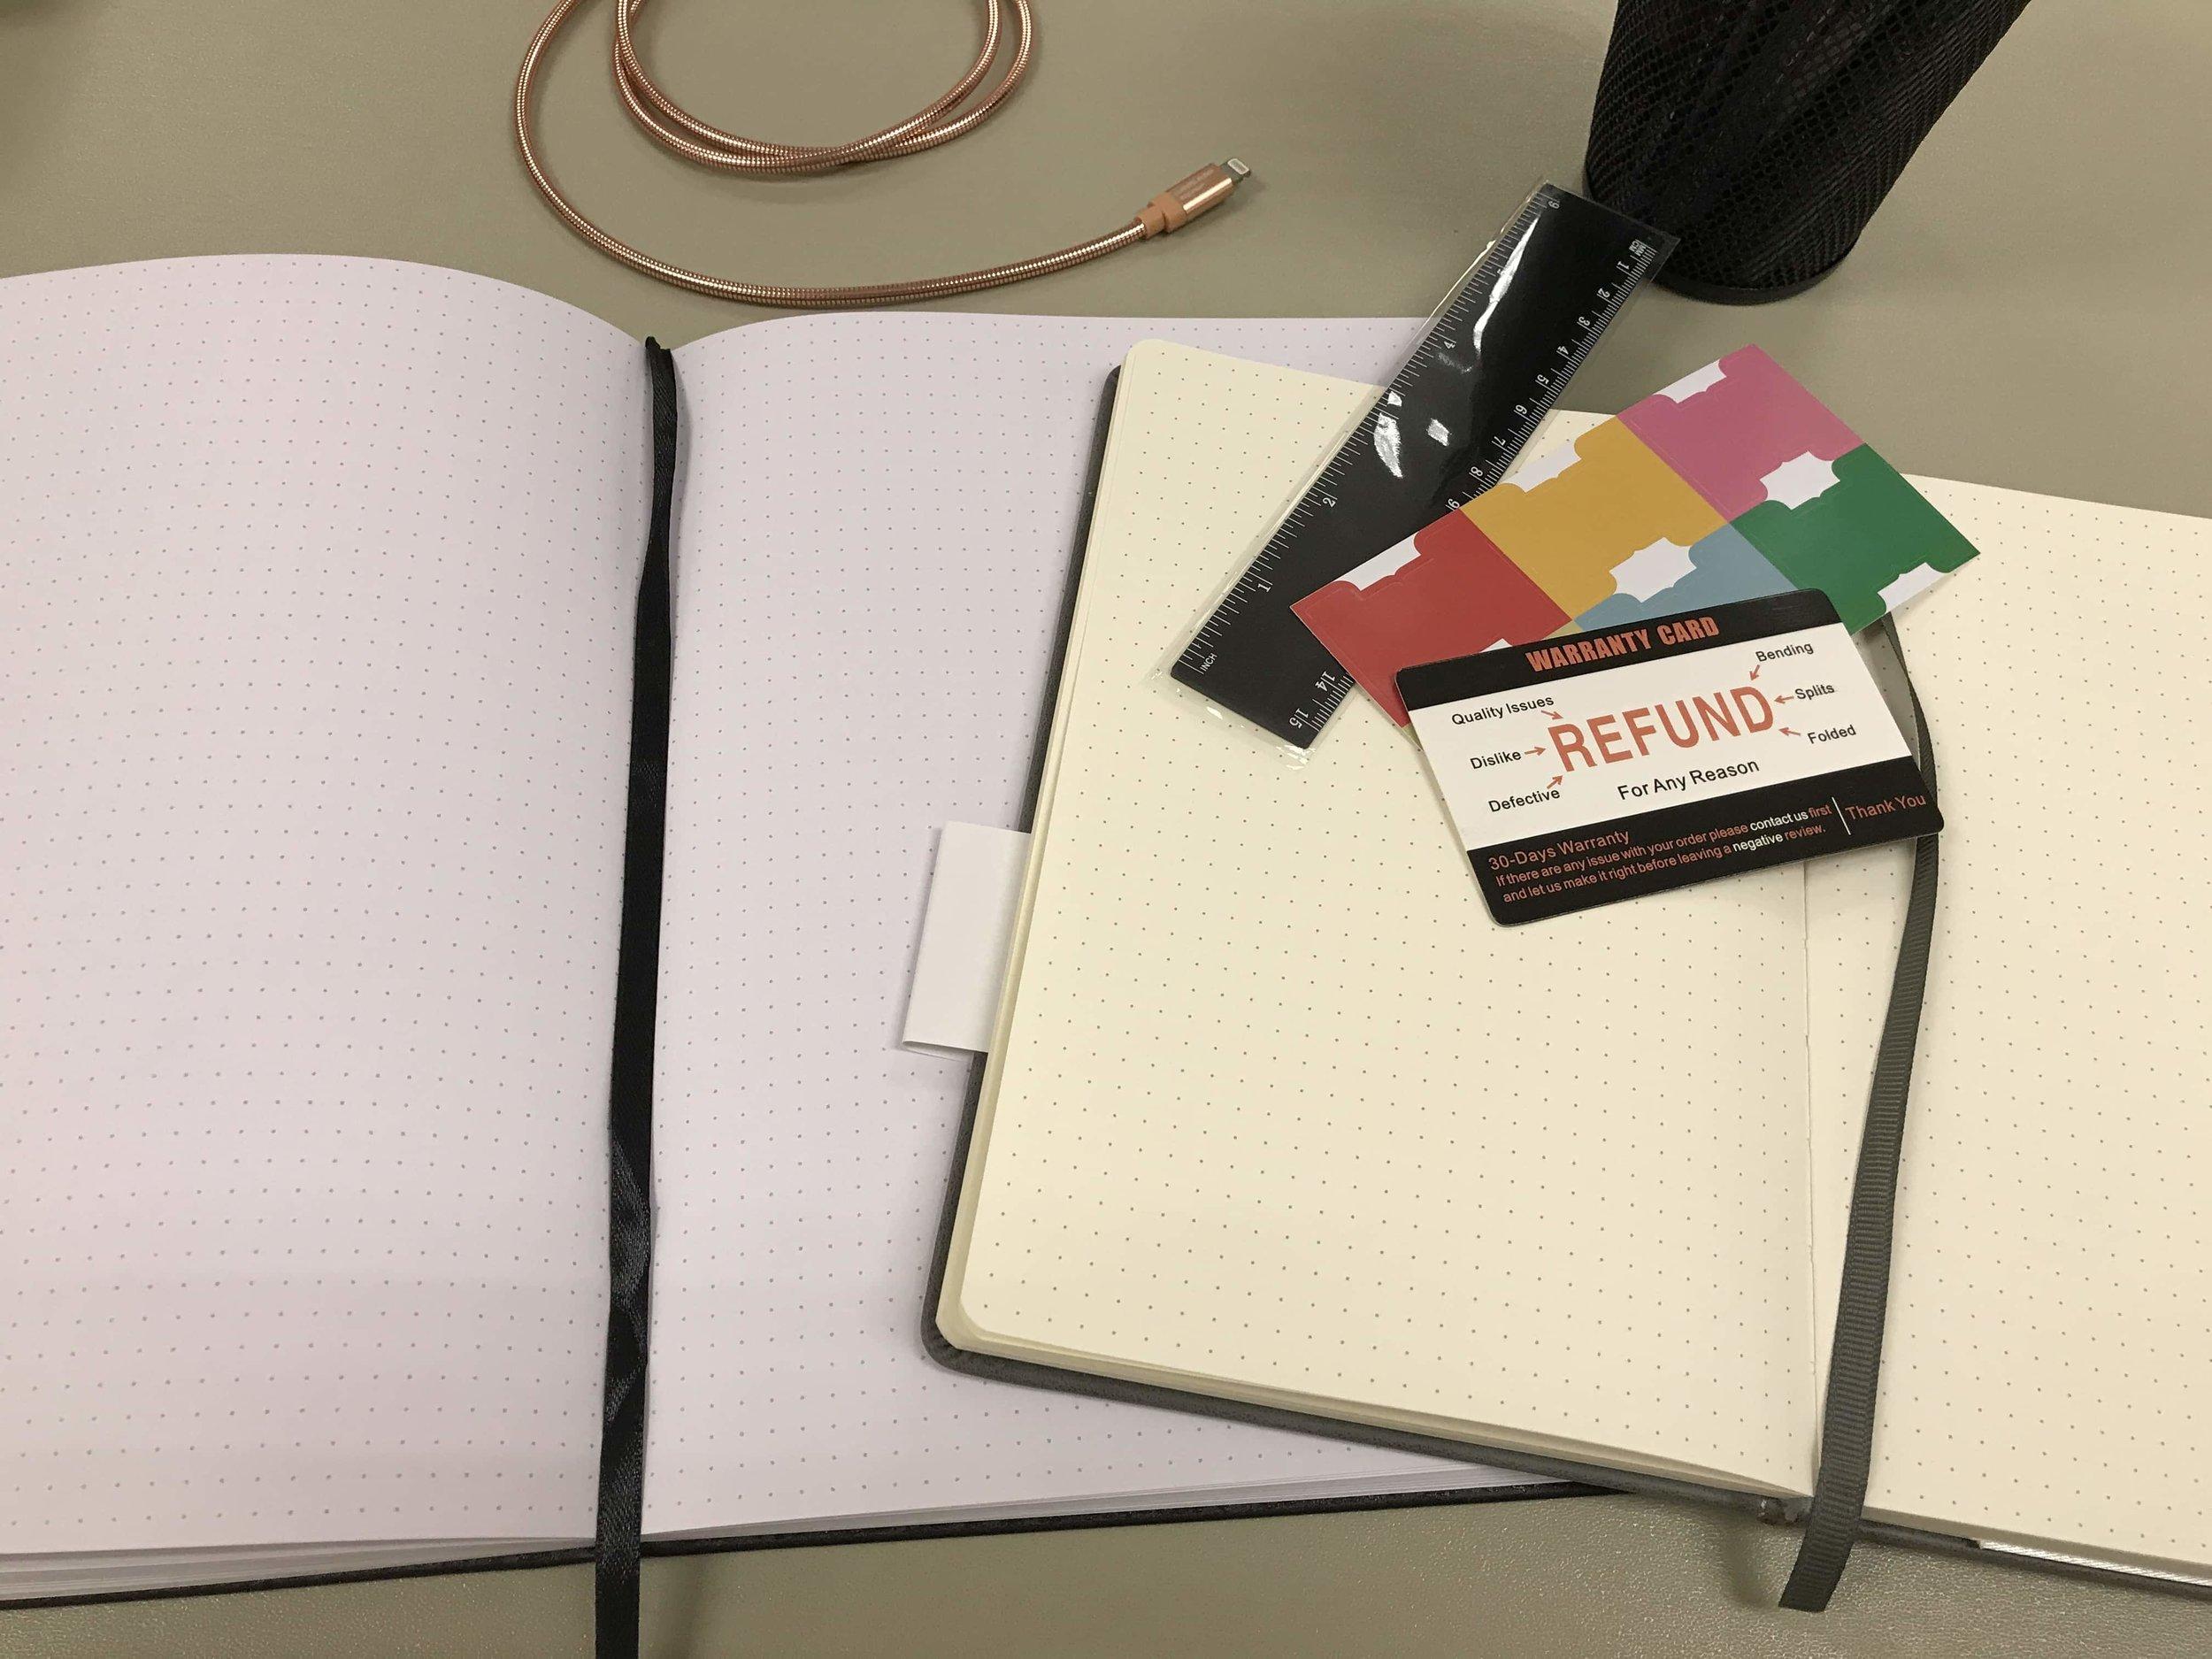 2019 Bullet Journal notebook Hashtags bujo planner Patricia Tiffany Morris.jpg